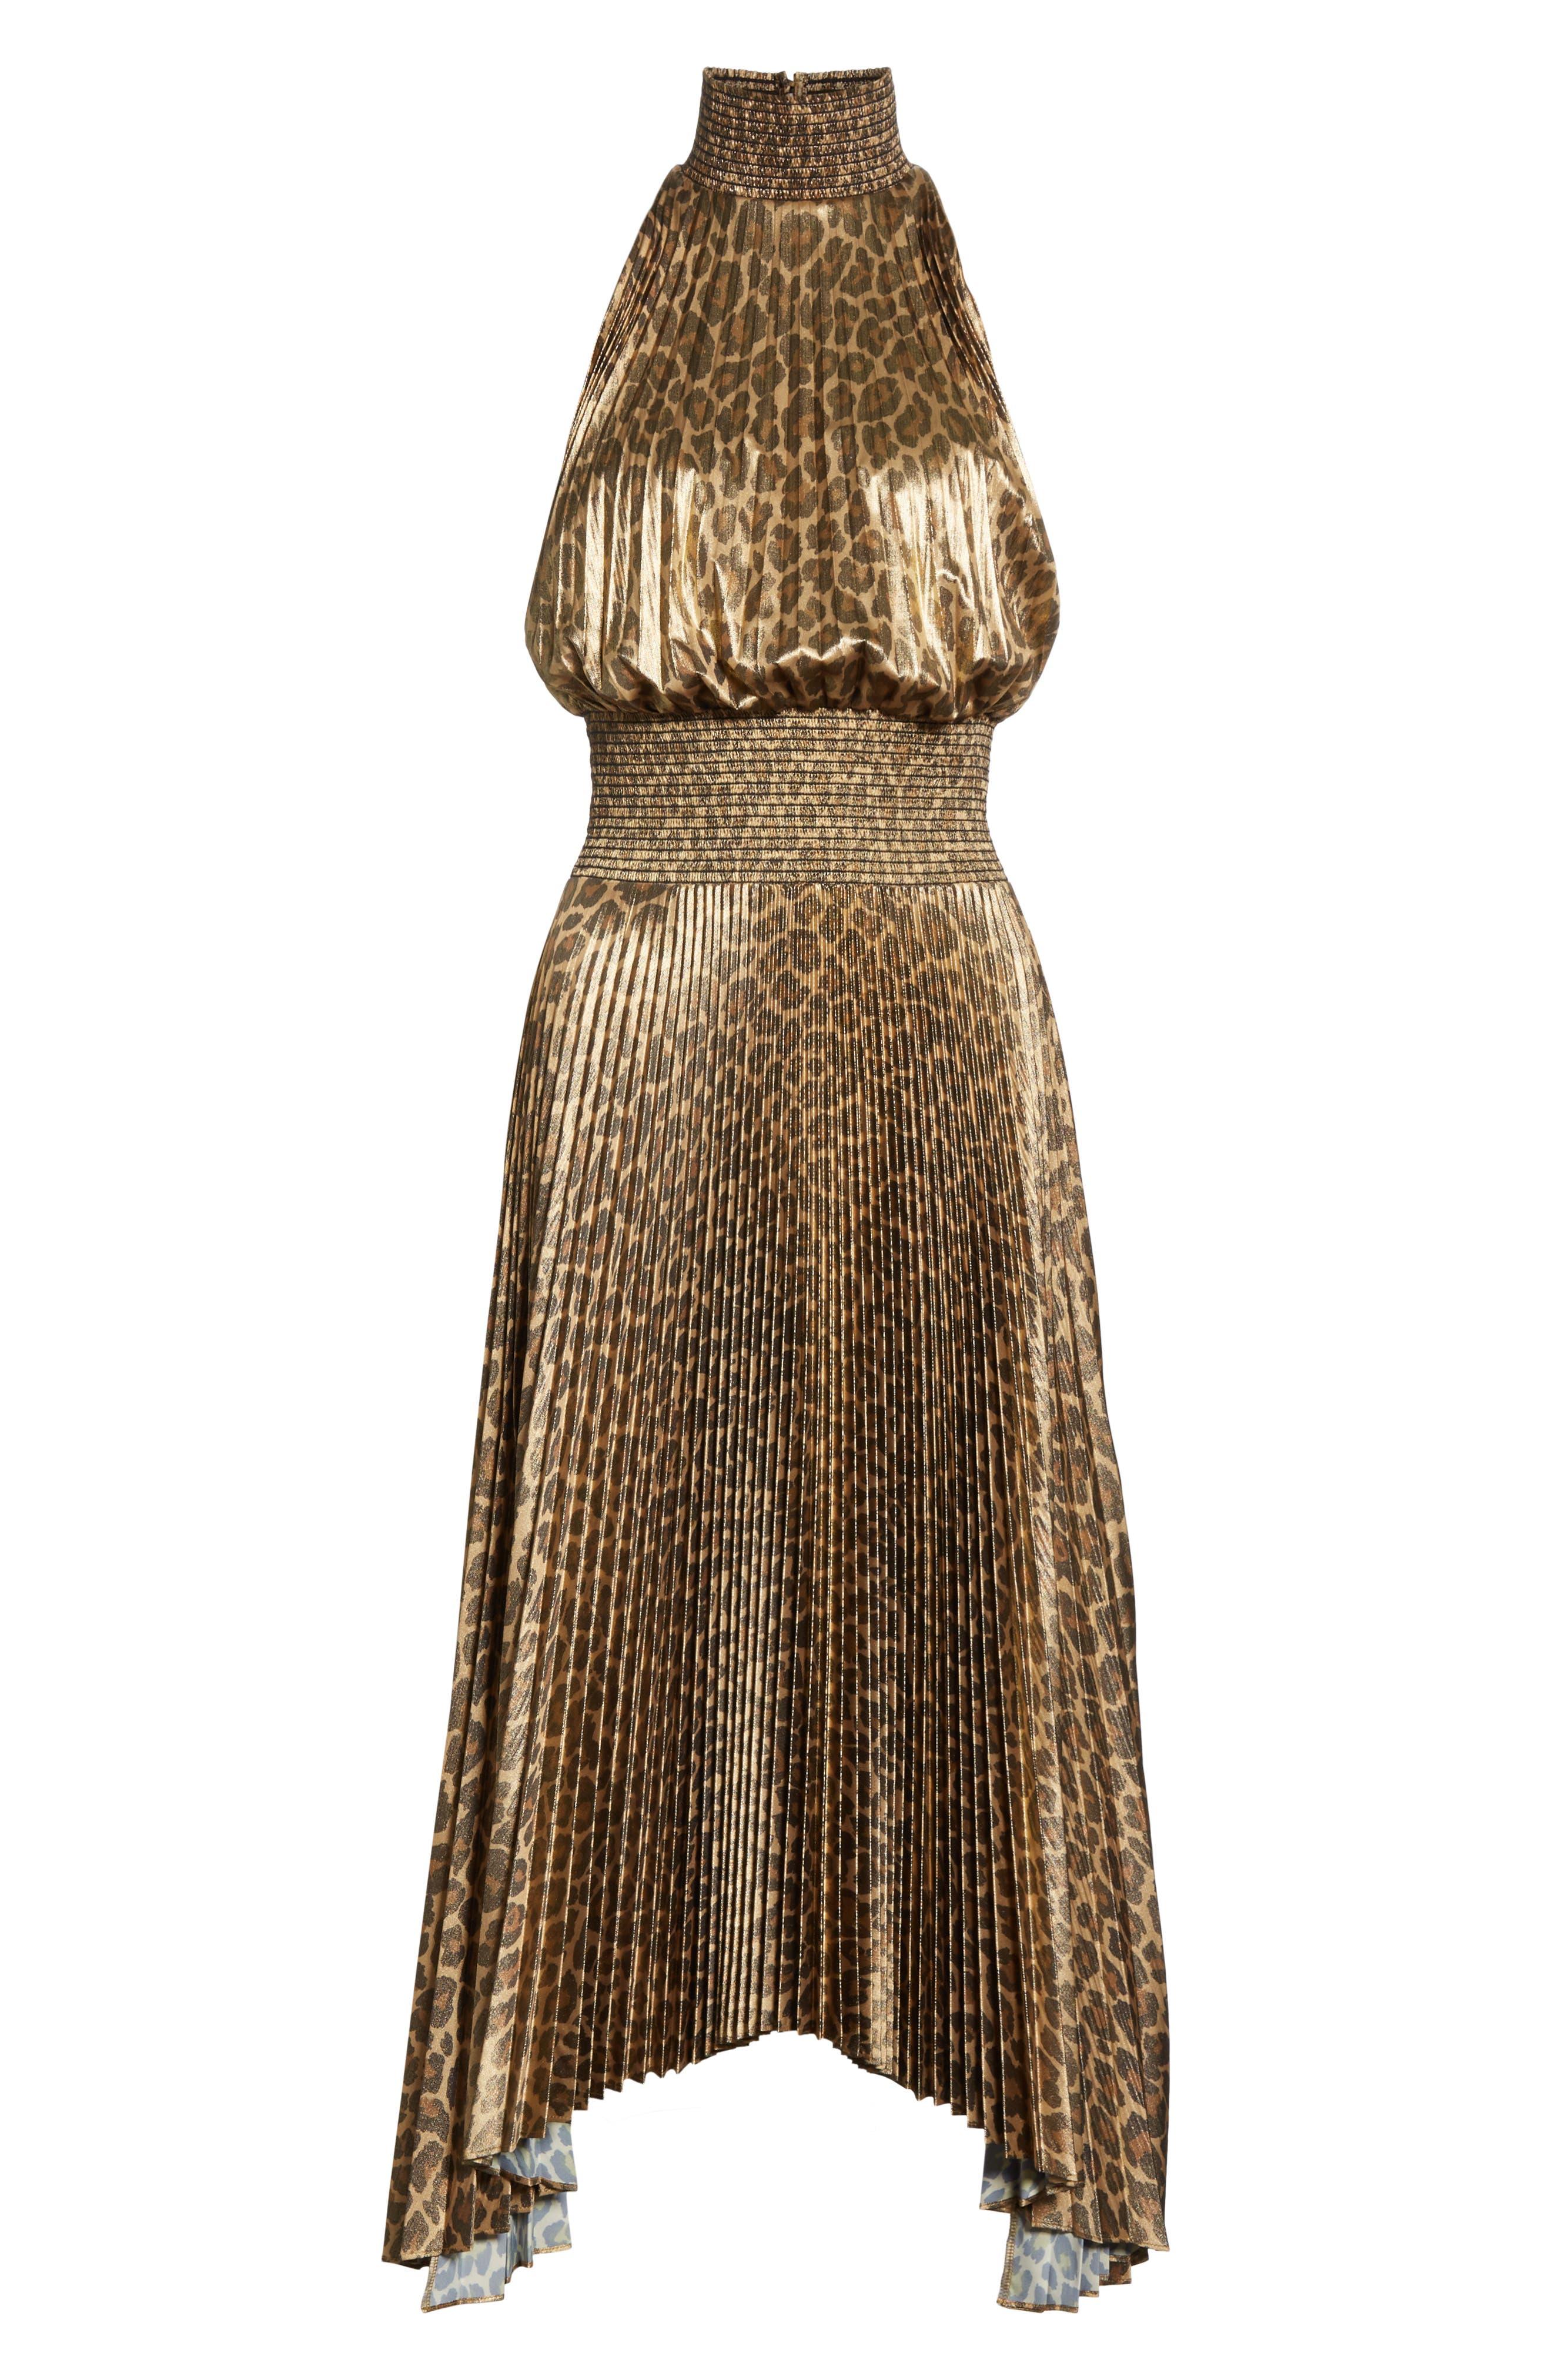 Renzo Leopard Print Metallic Foil Dress,                             Alternate thumbnail 6, color,                             METALLIC GOLD